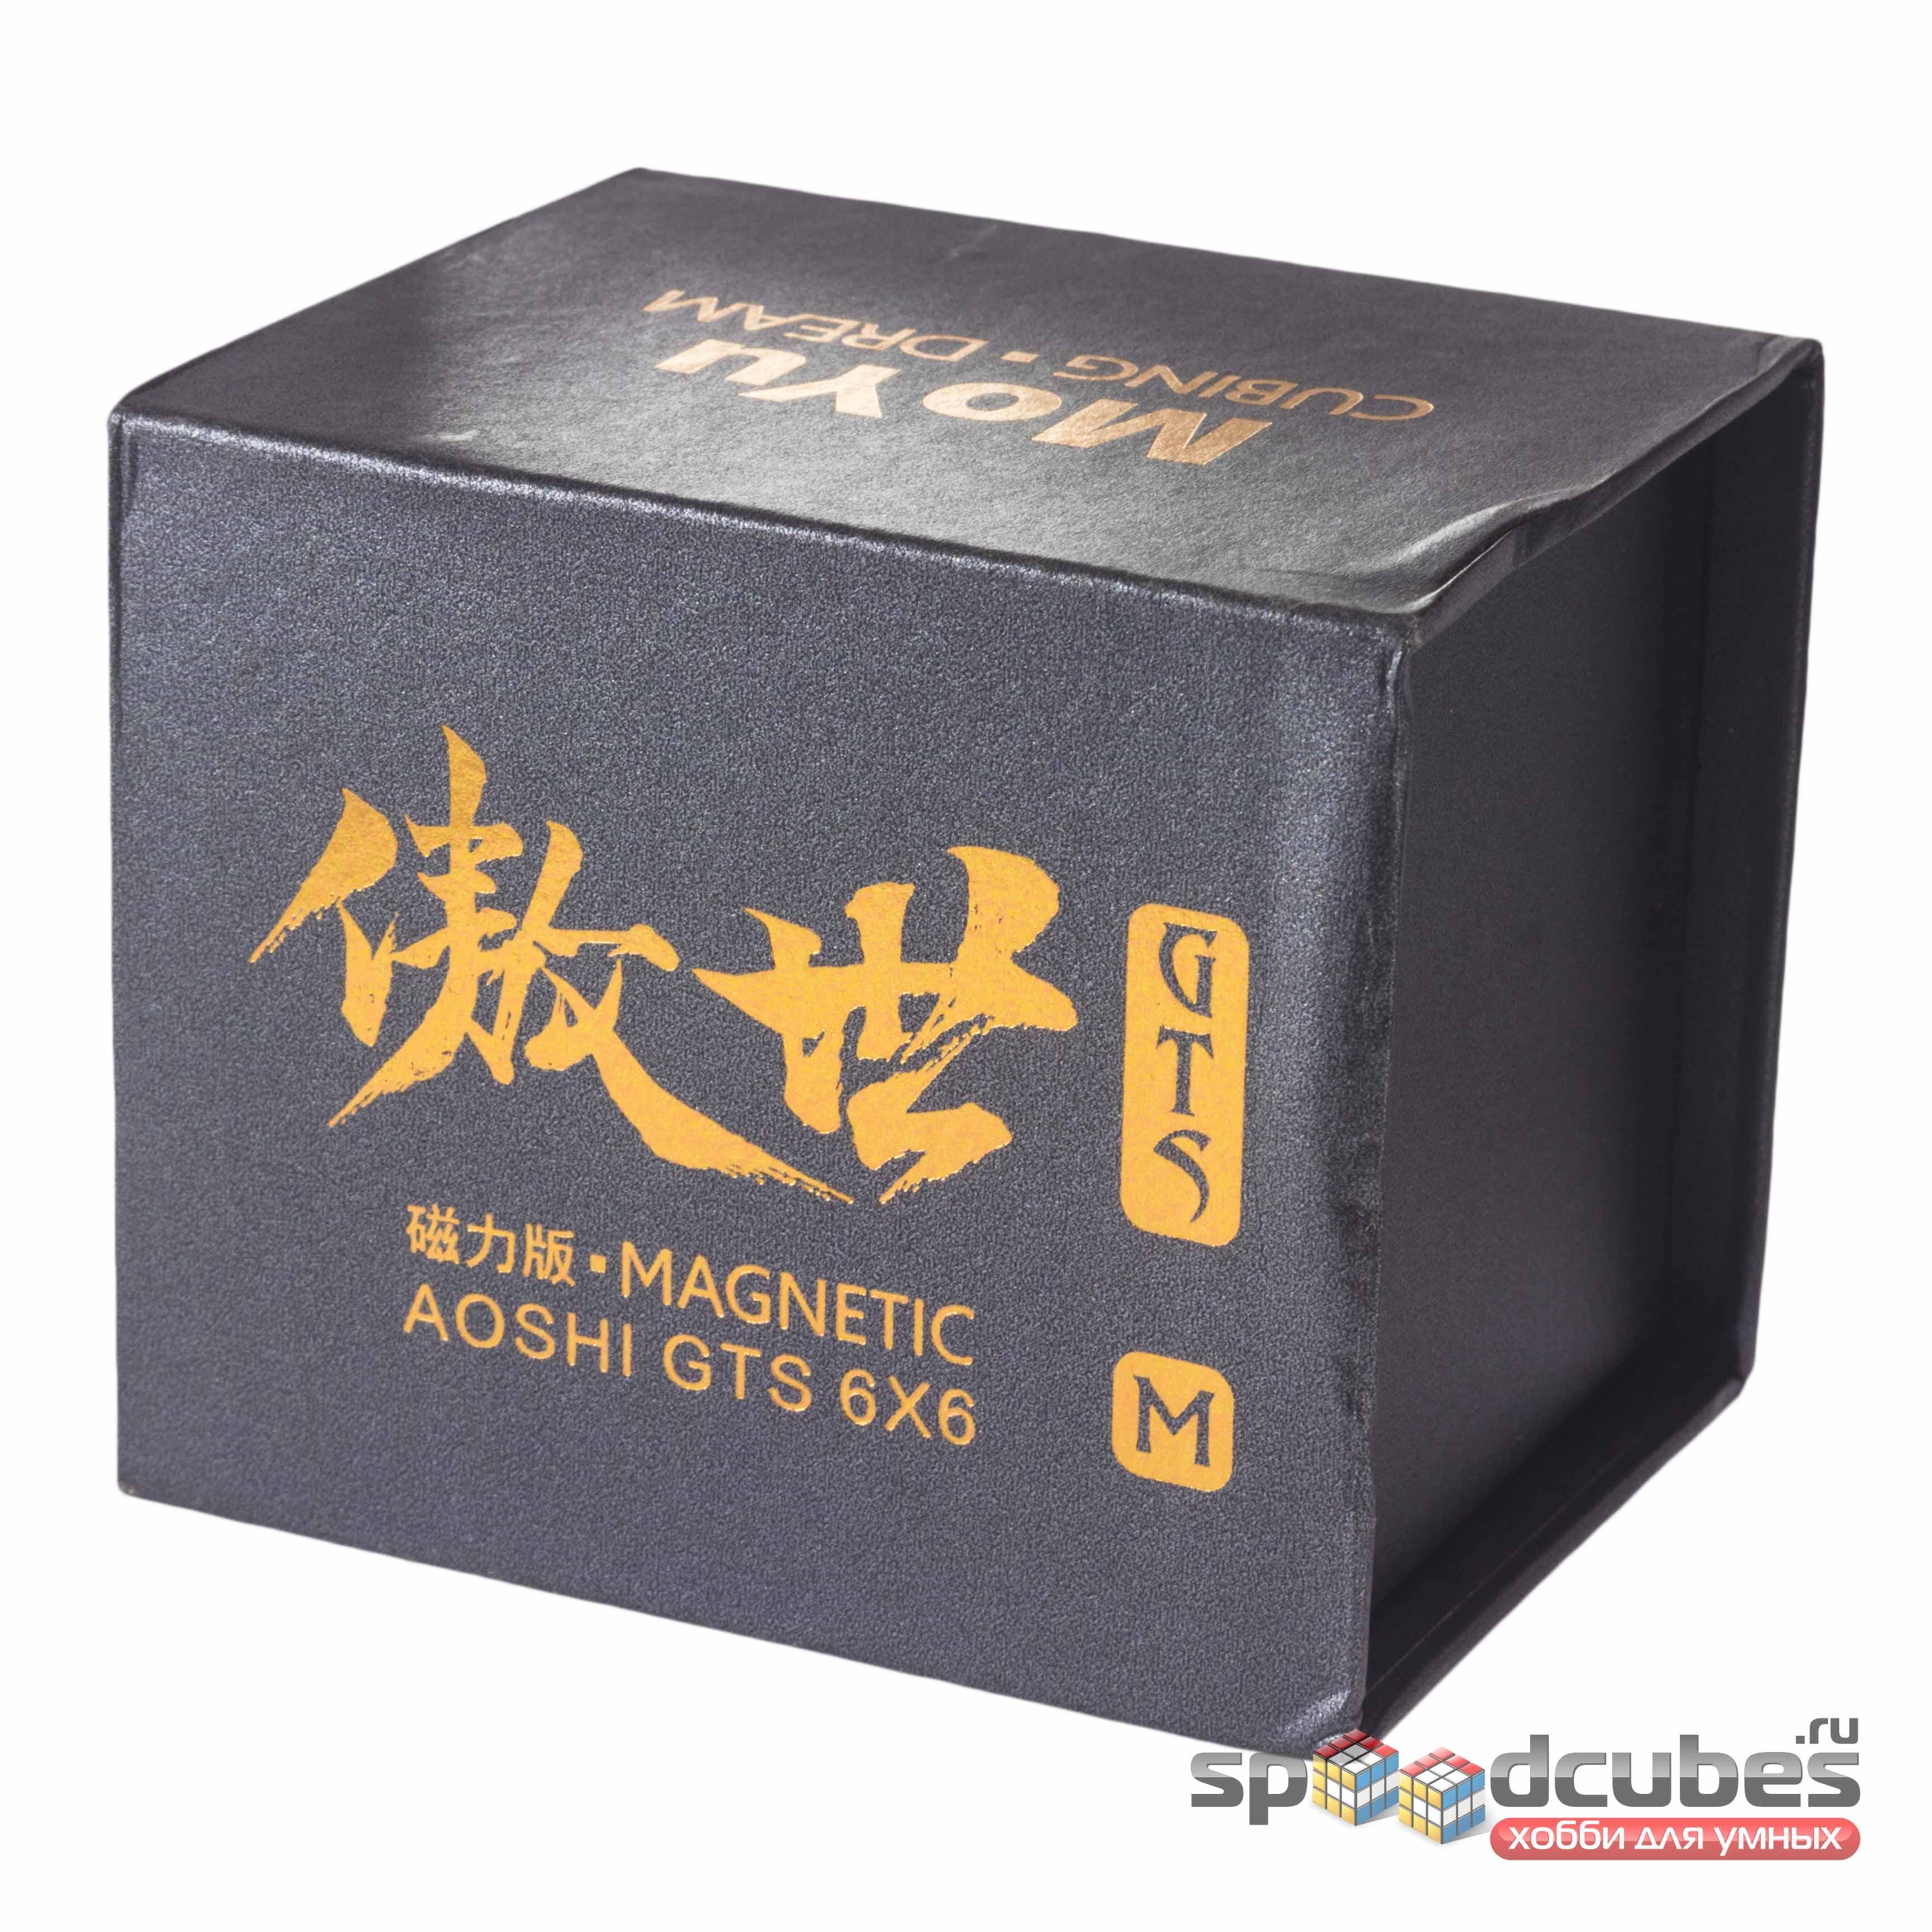 MoYu 6x6x6 Aoshi GTS M Color 1